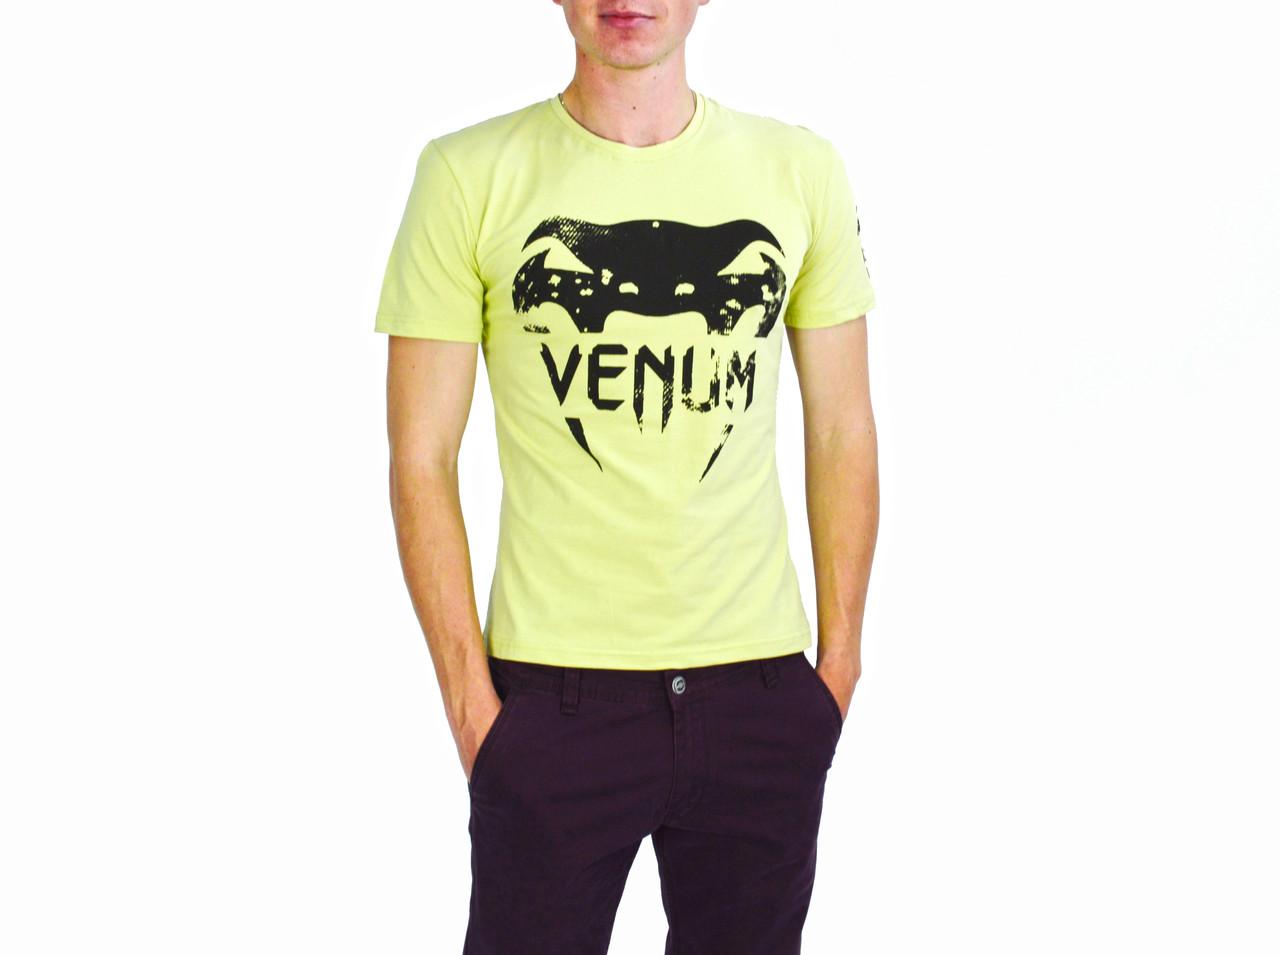 Бледно-желтая мужская футболка с рисунком VENUM на лето